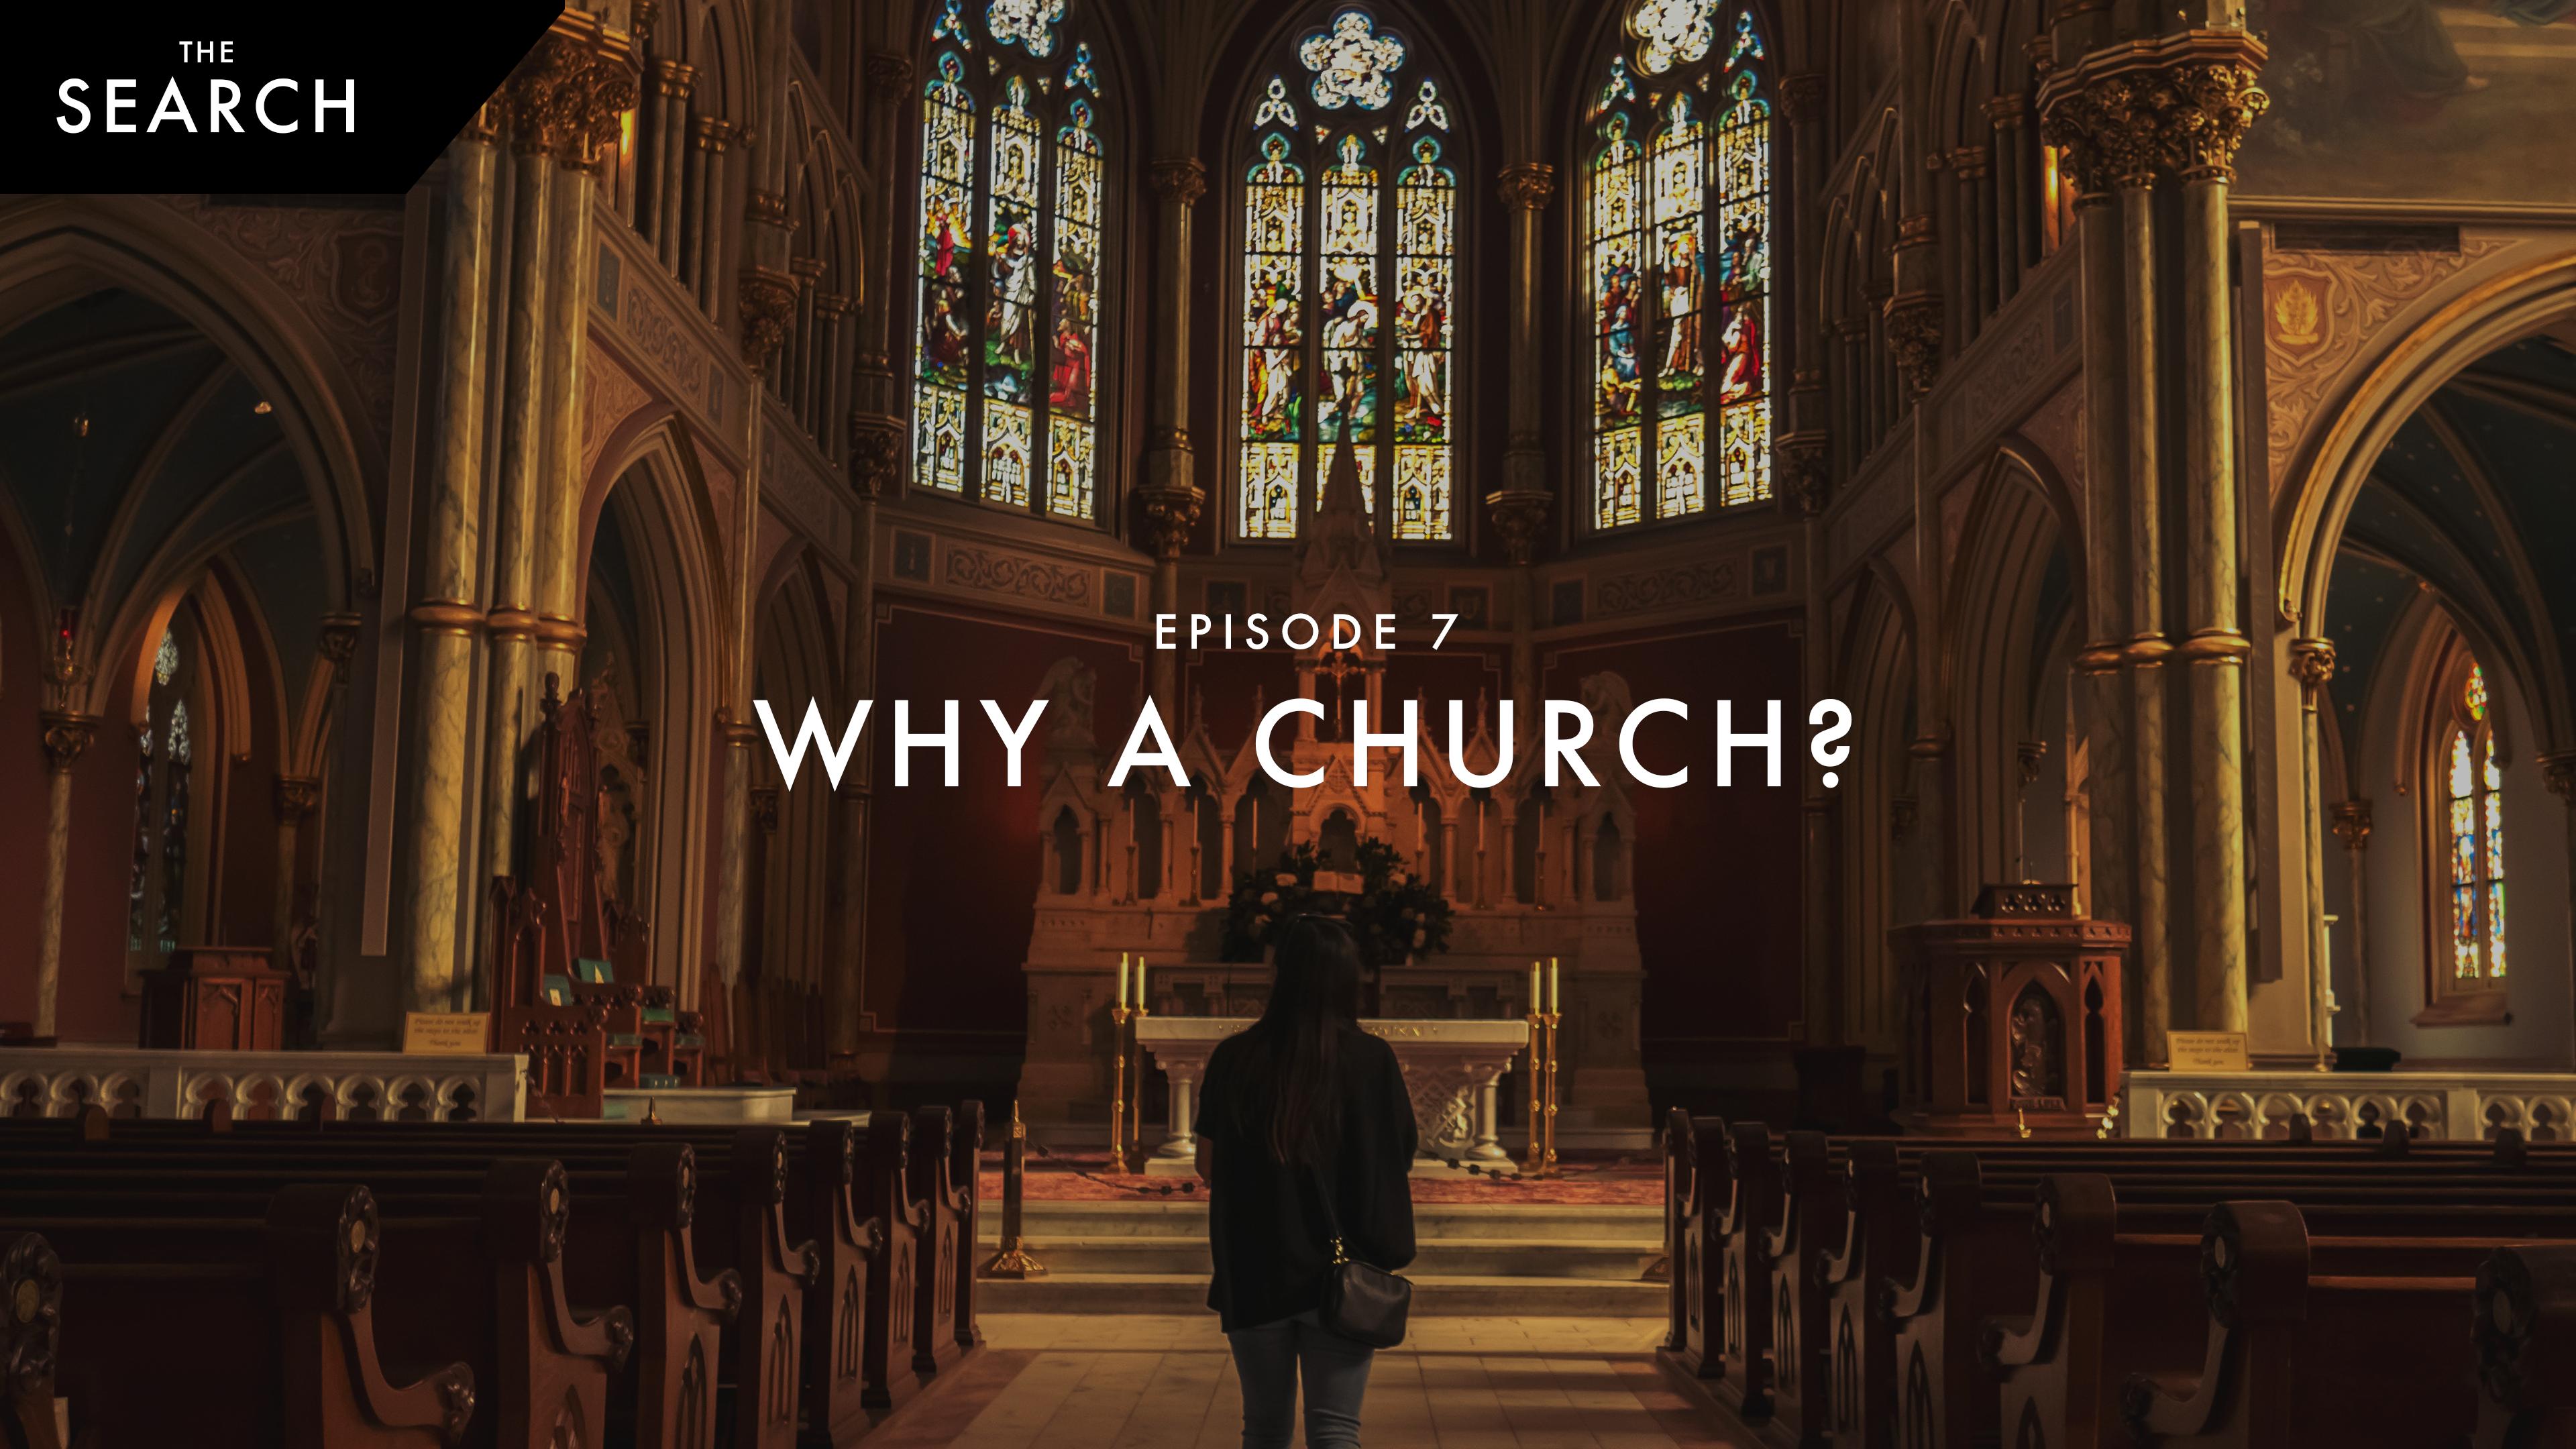 Episode 7: Why A Church?